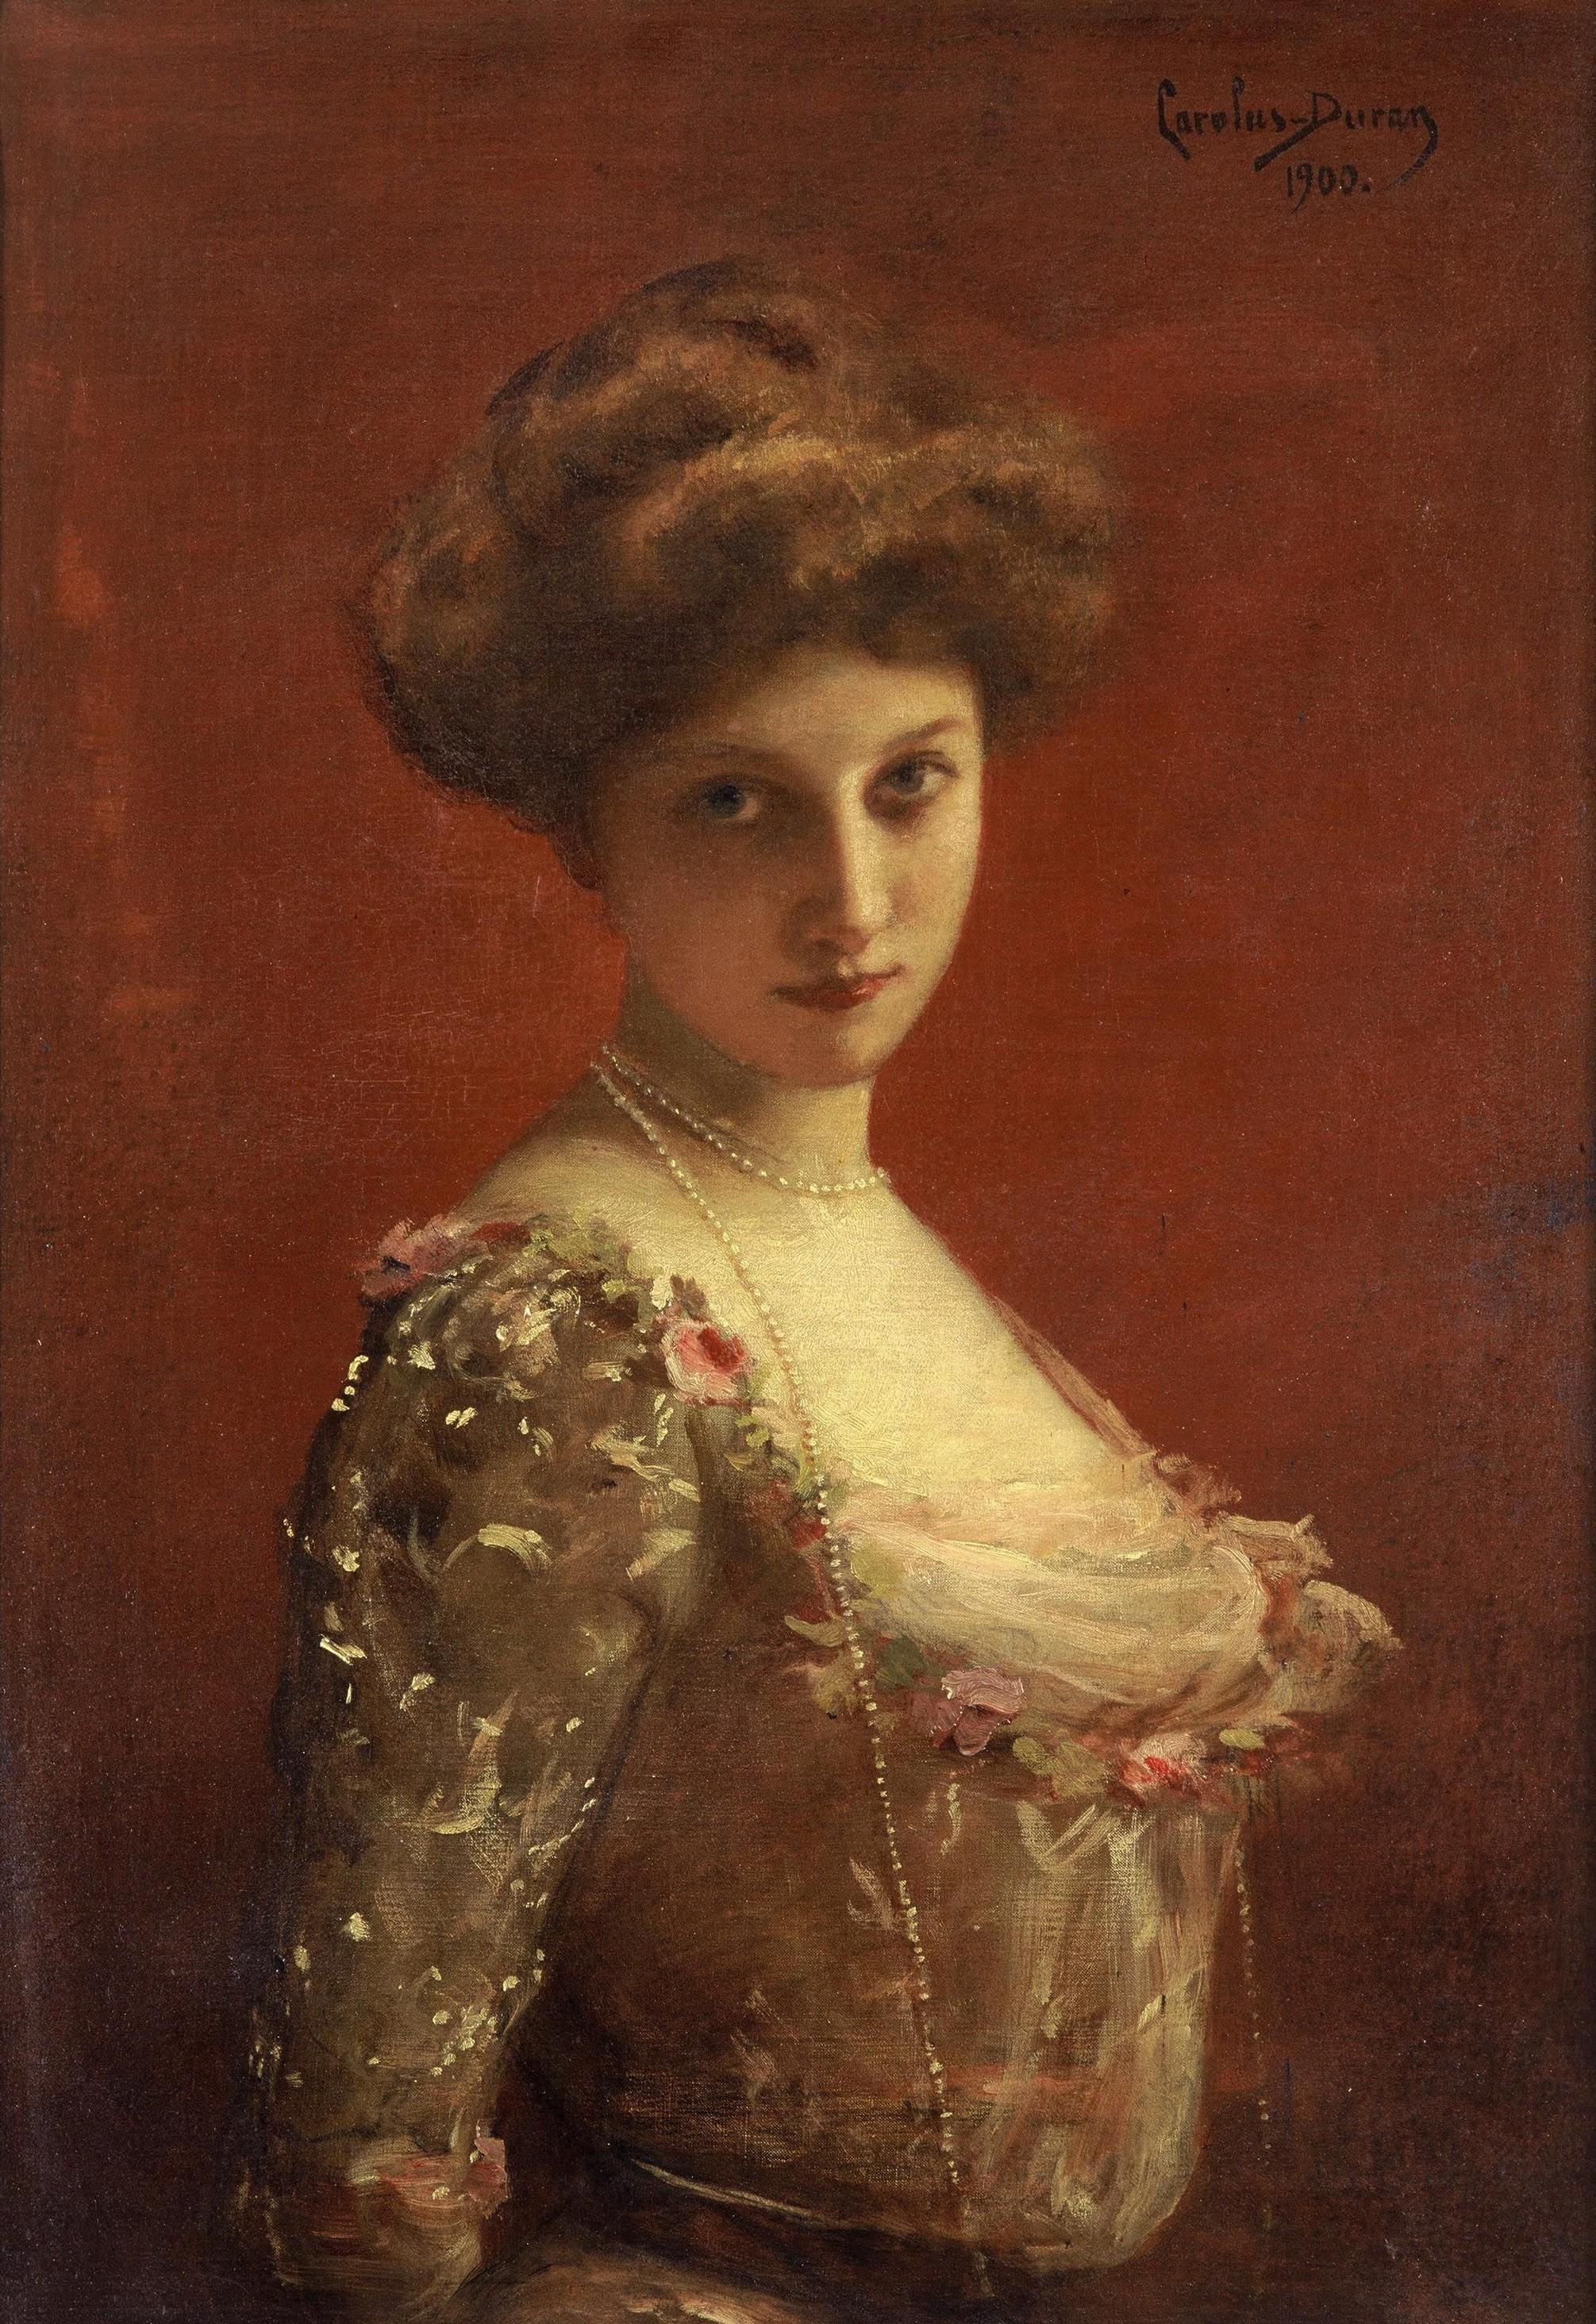 Jane Henriot par Carolus Duran en 1900